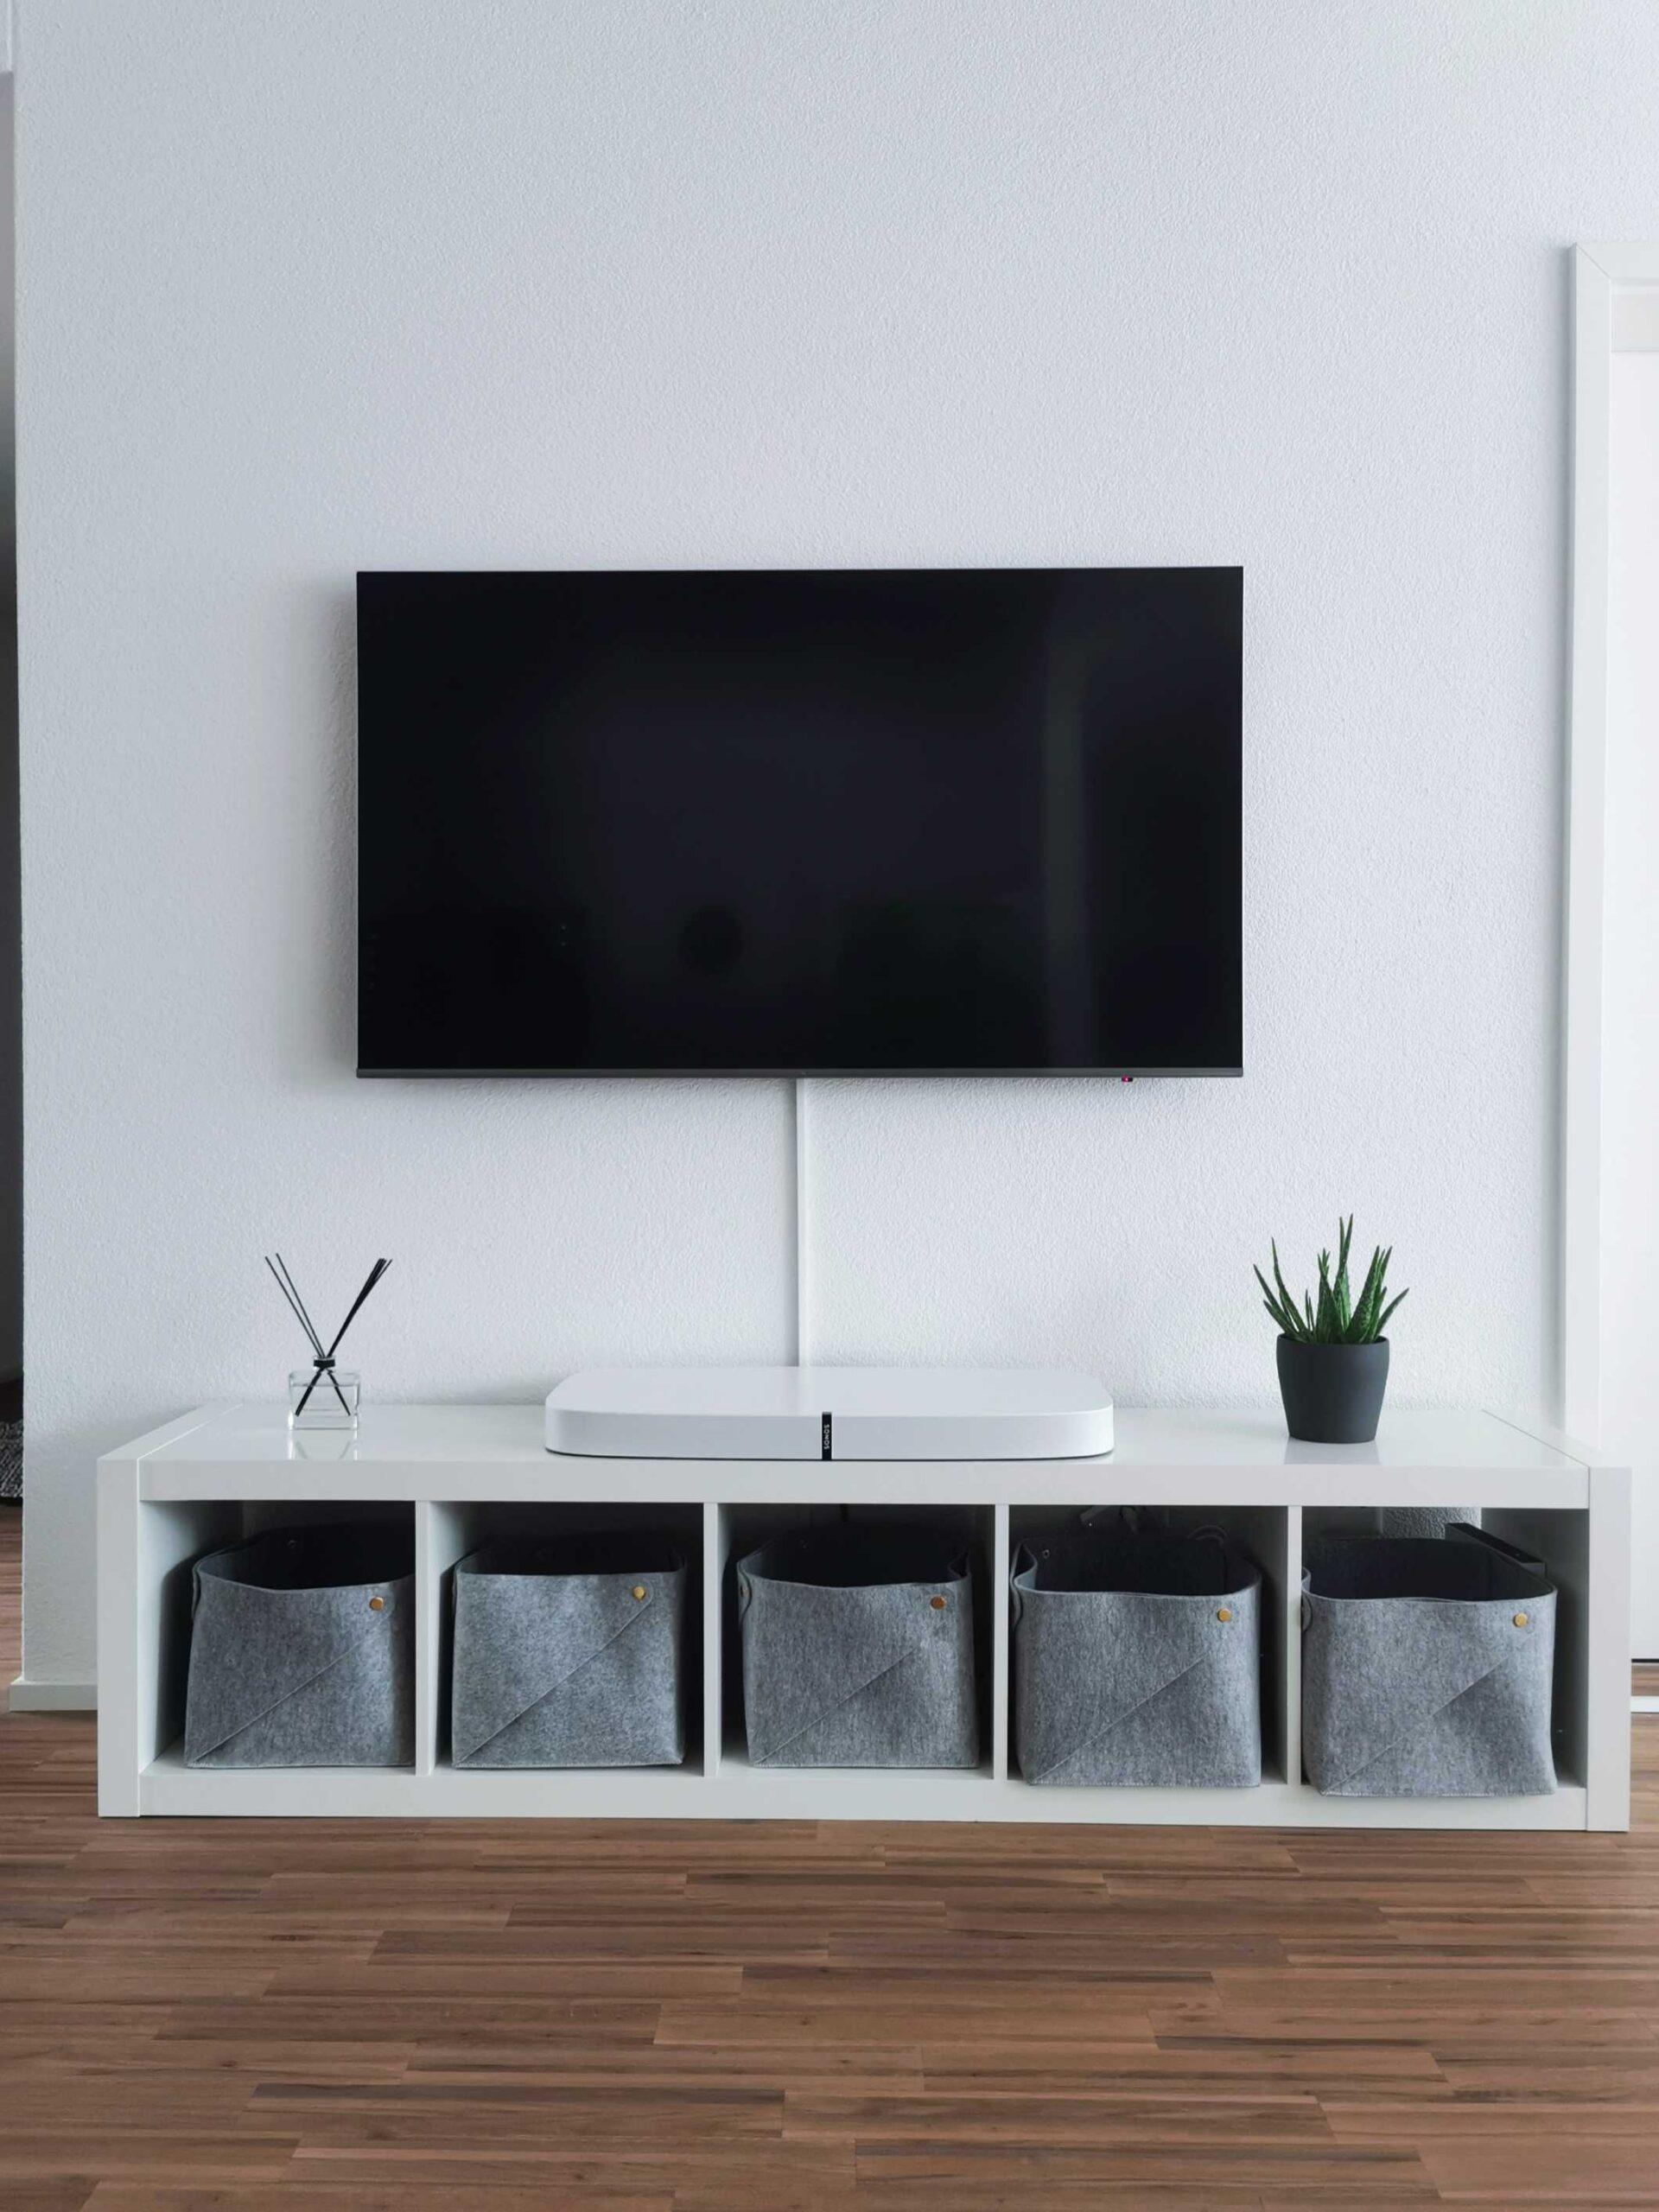 Ways to Hide TV wires